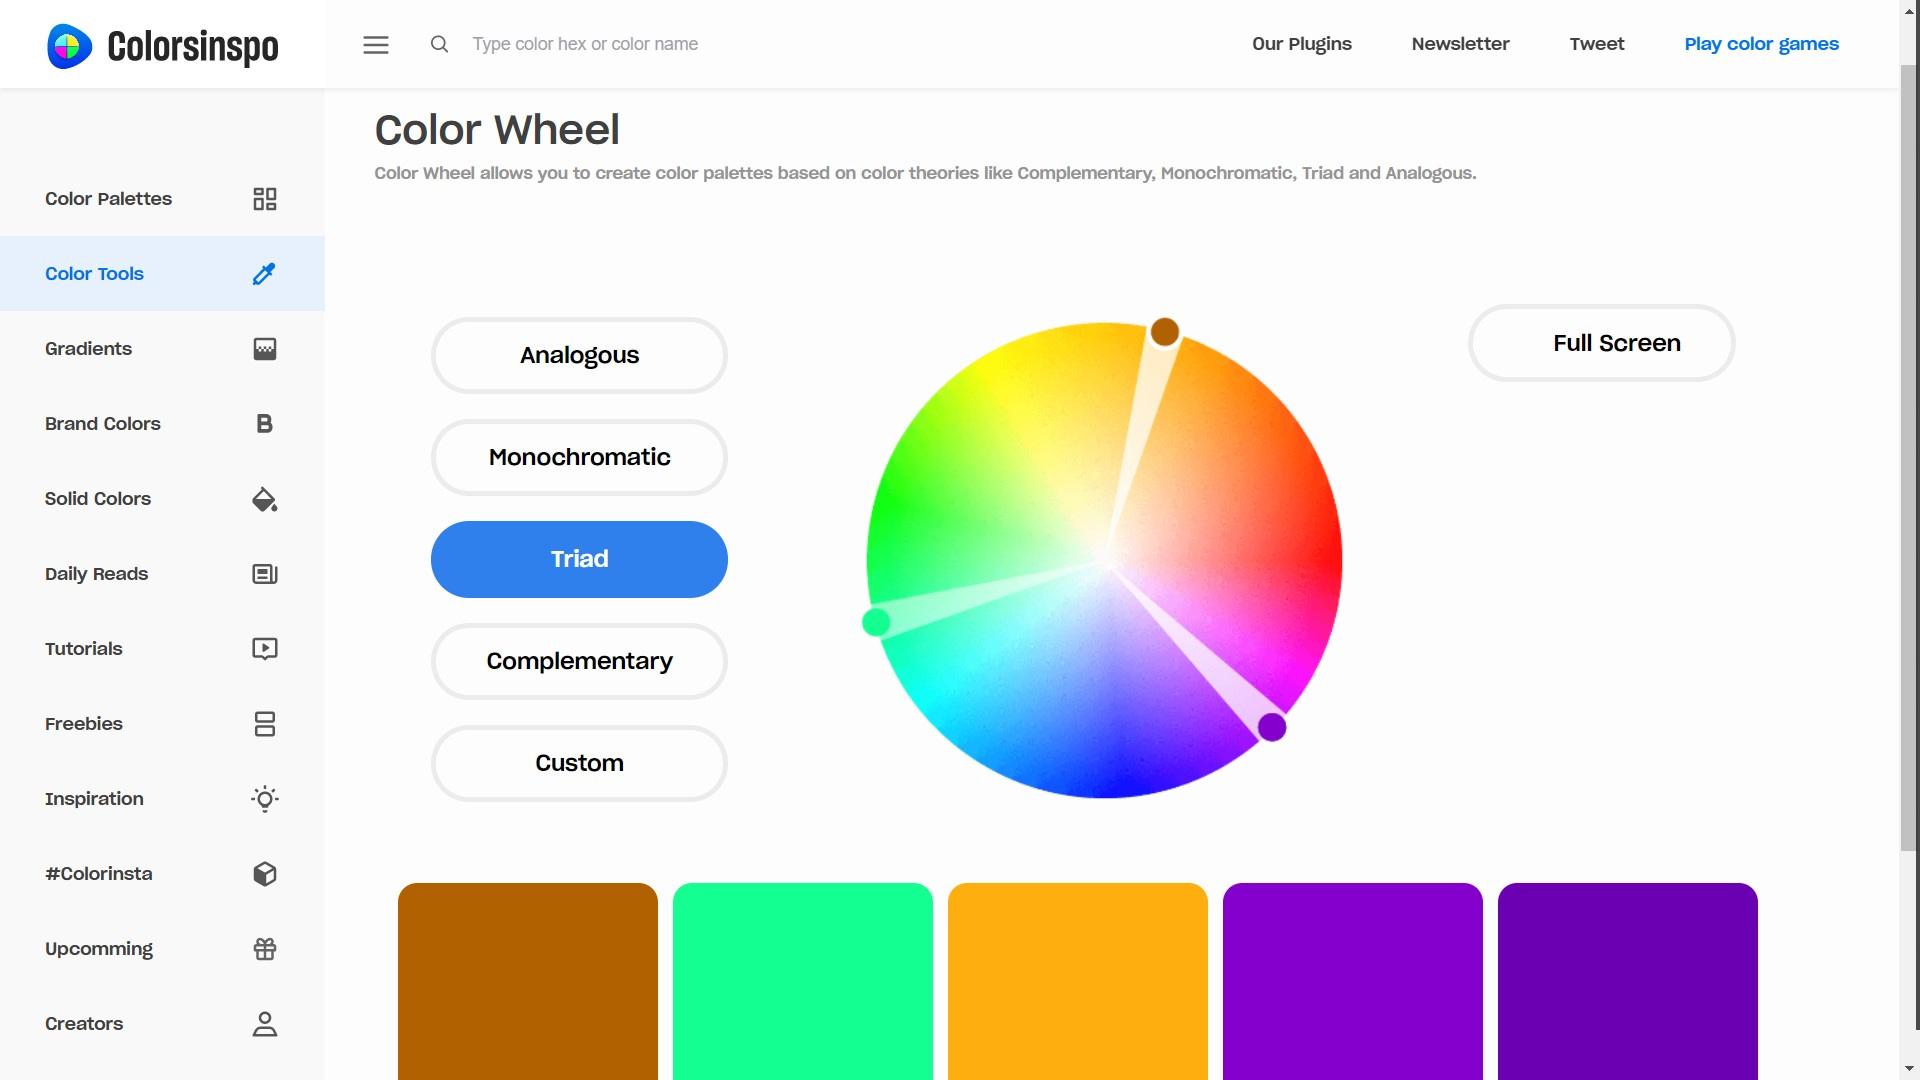 Colorsinspo - Color Wheel Screenshot